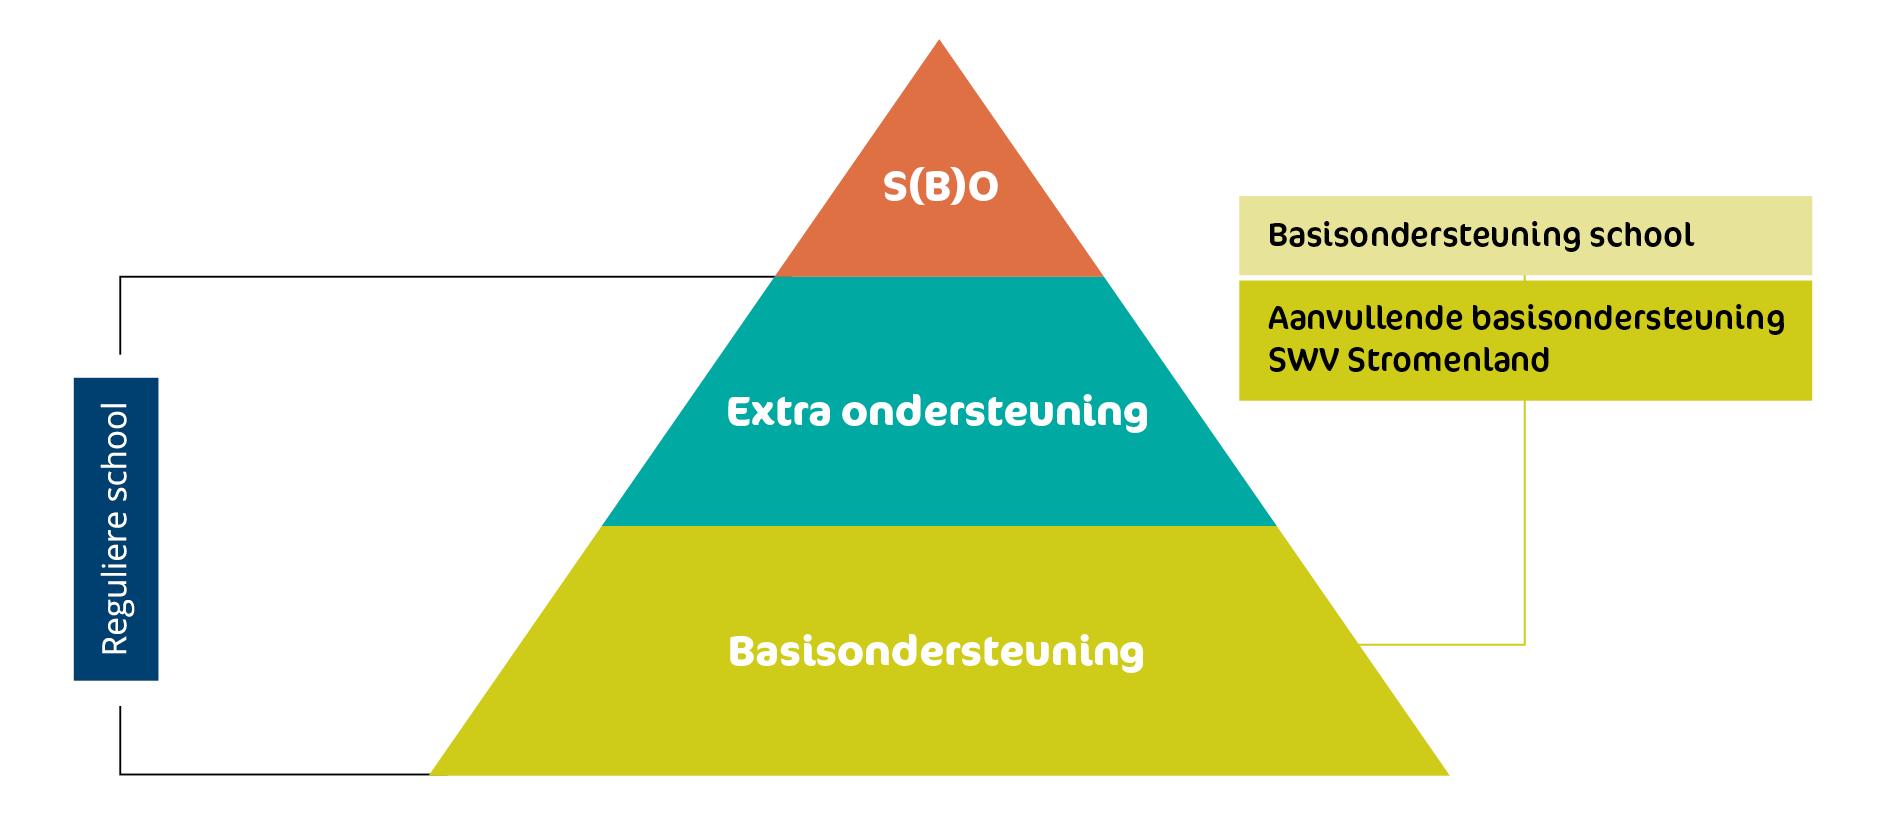 SWV_Stromenland_Piramide